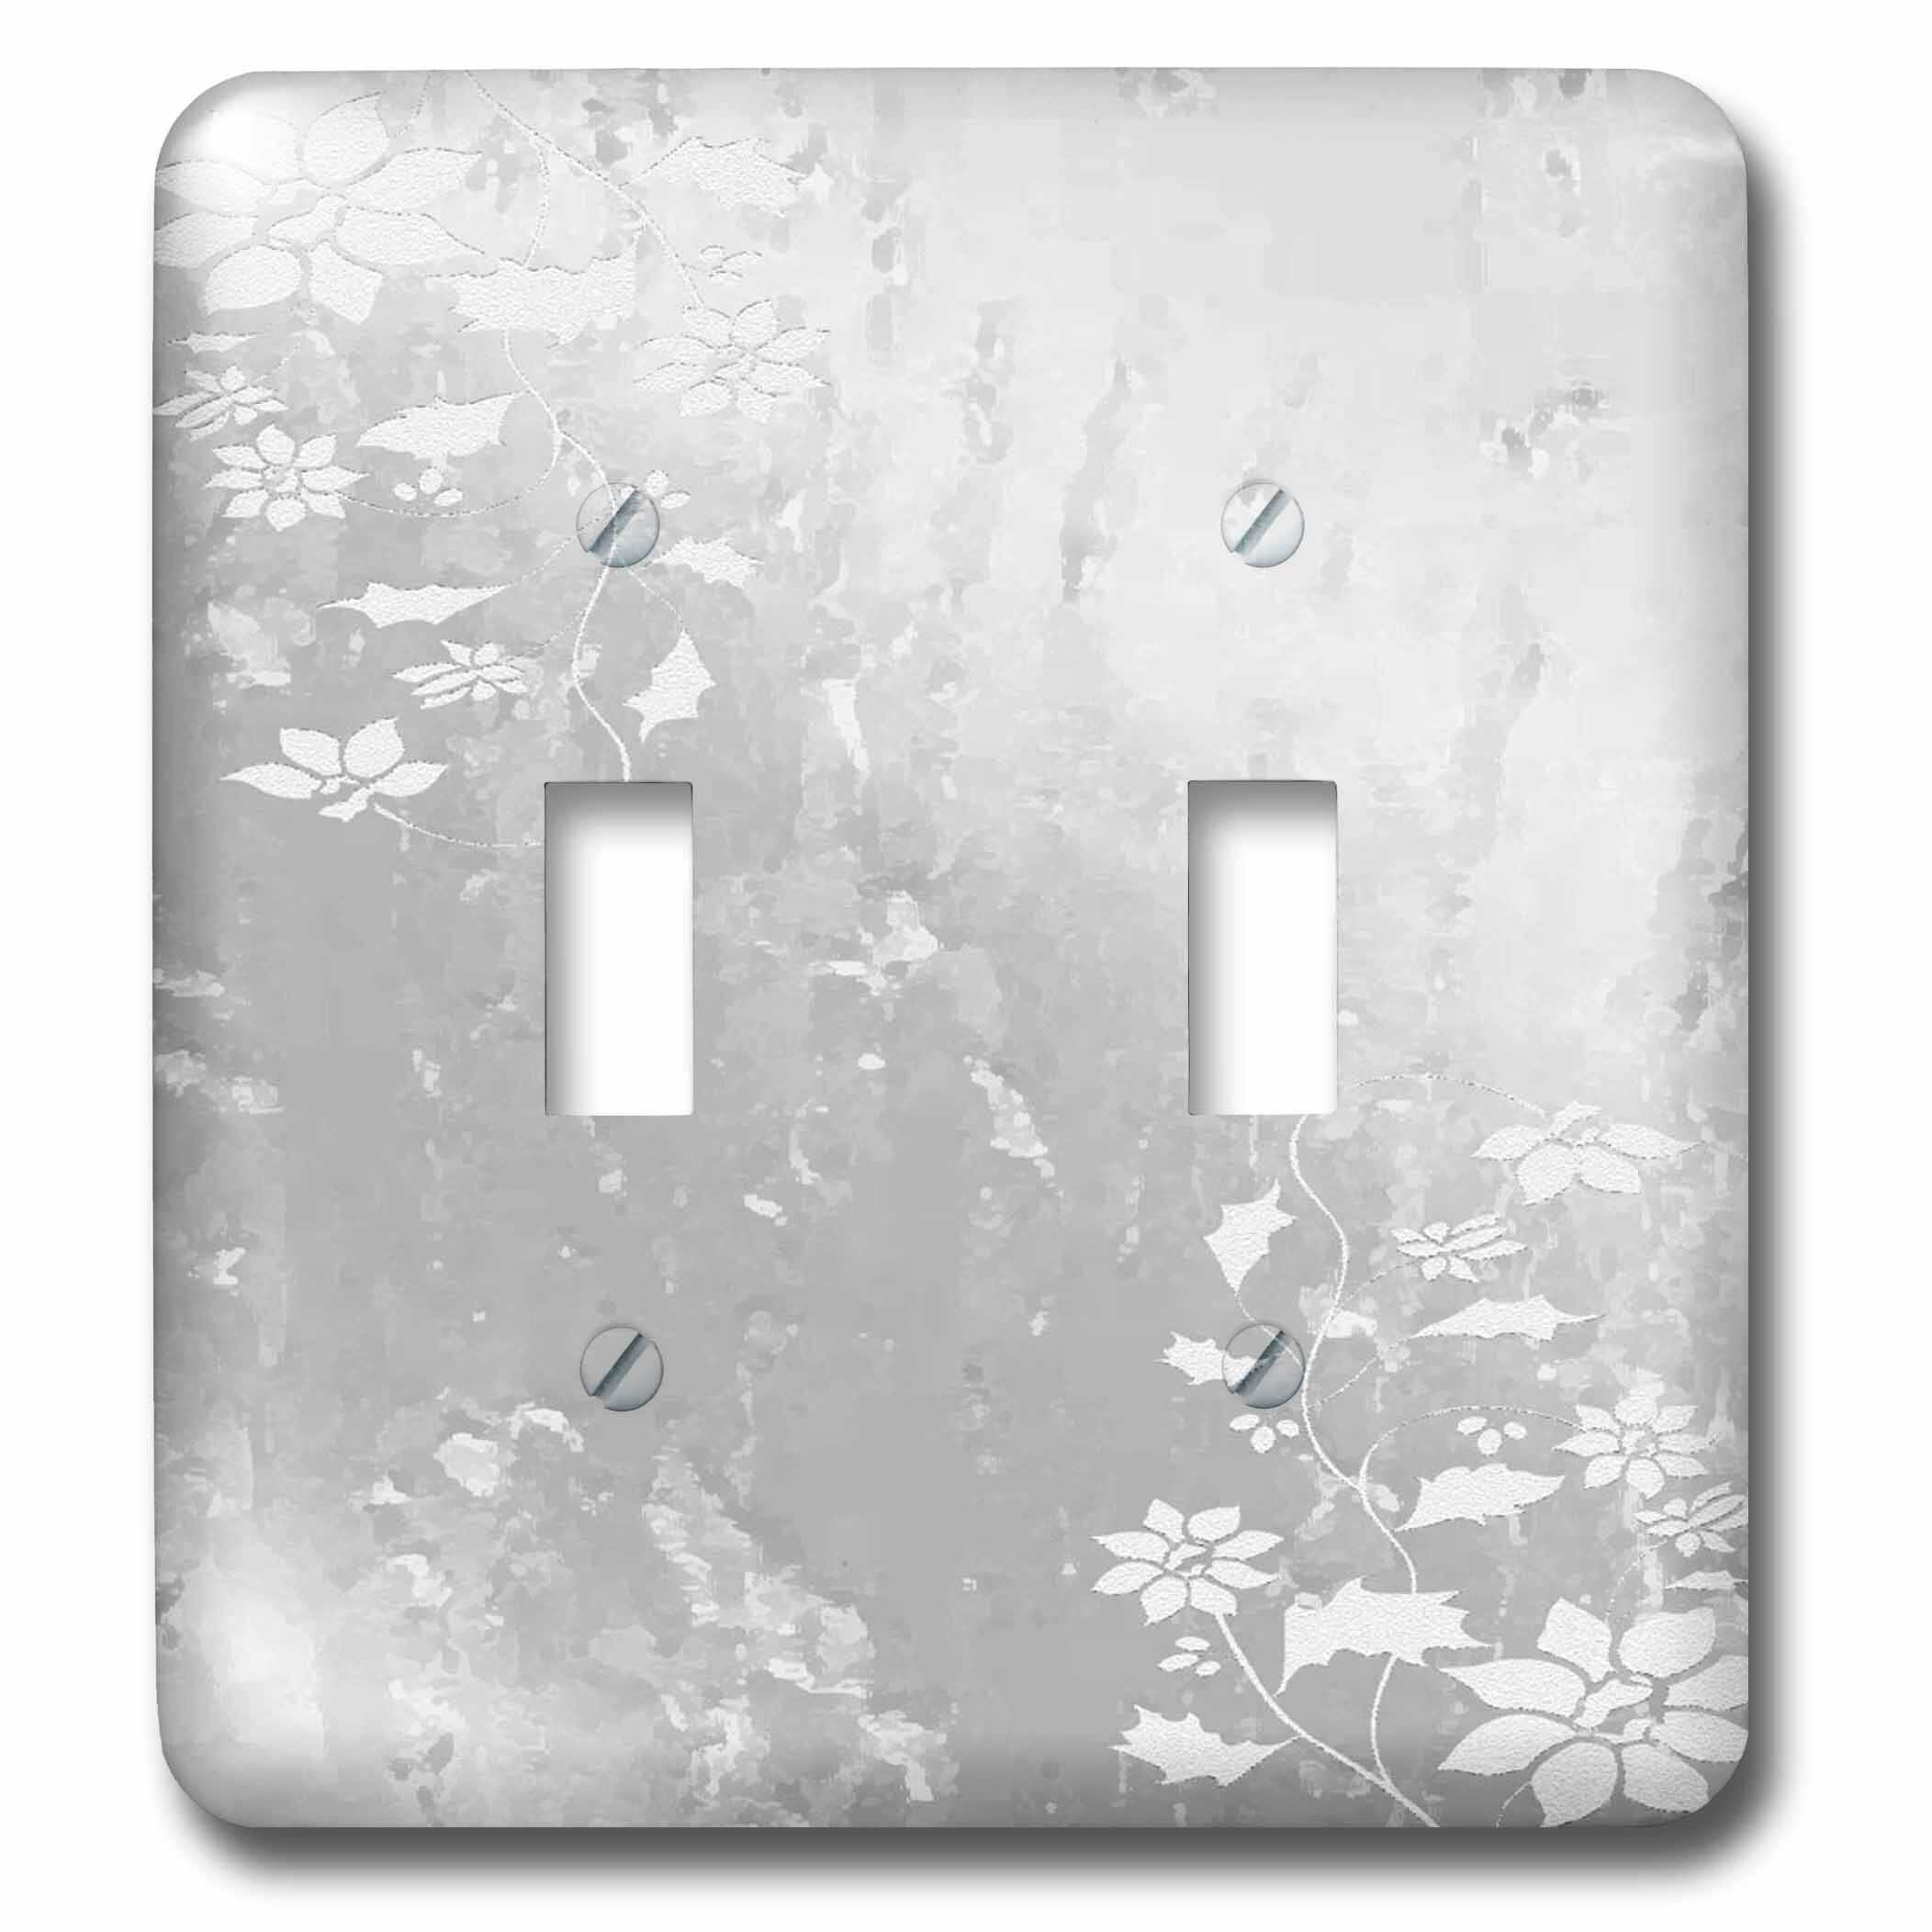 3drose Flowers 2 Gang Toggle Light Switch Wall Plate Reviews Wayfair